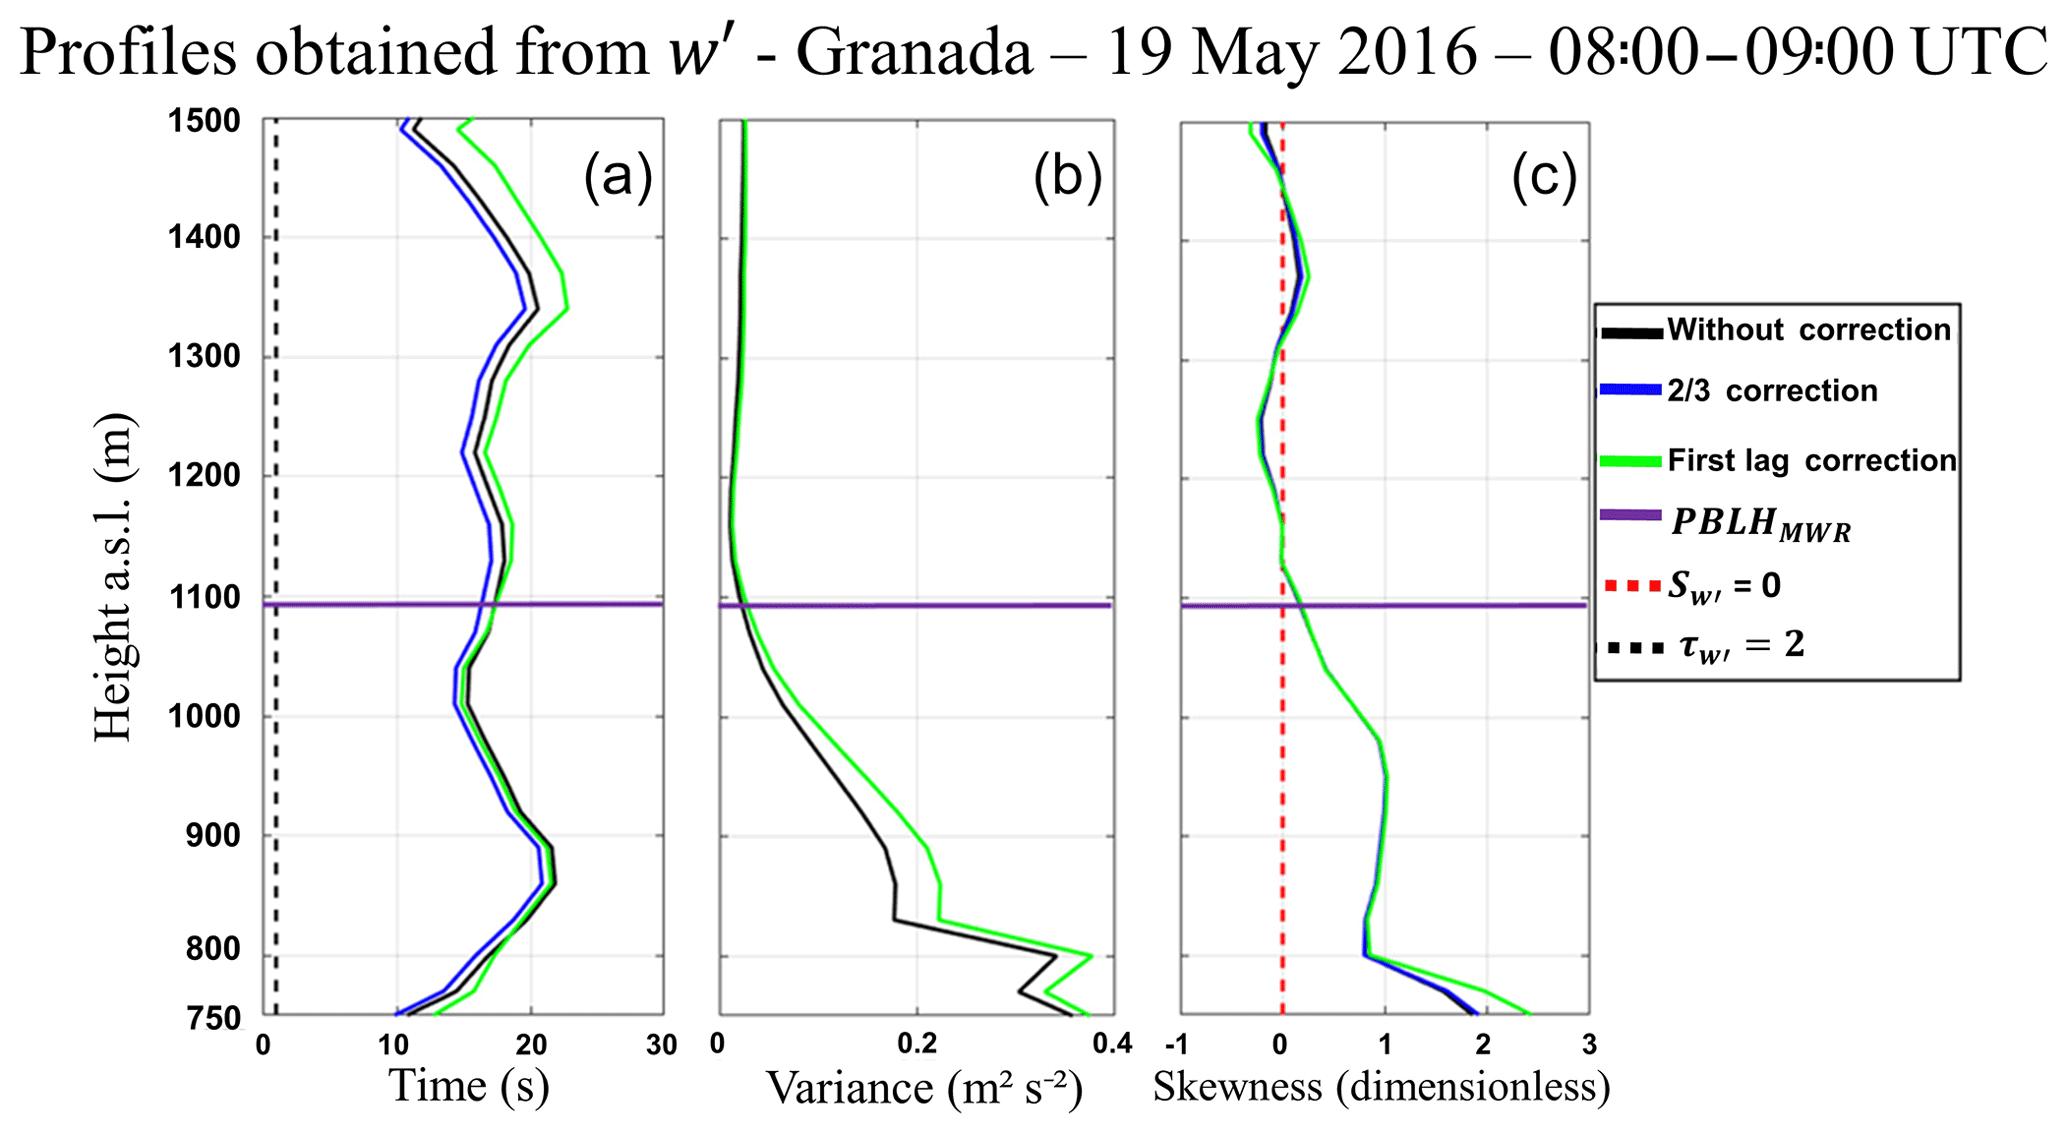 ACP - Analyzing the turbulent planetary boundary layer by